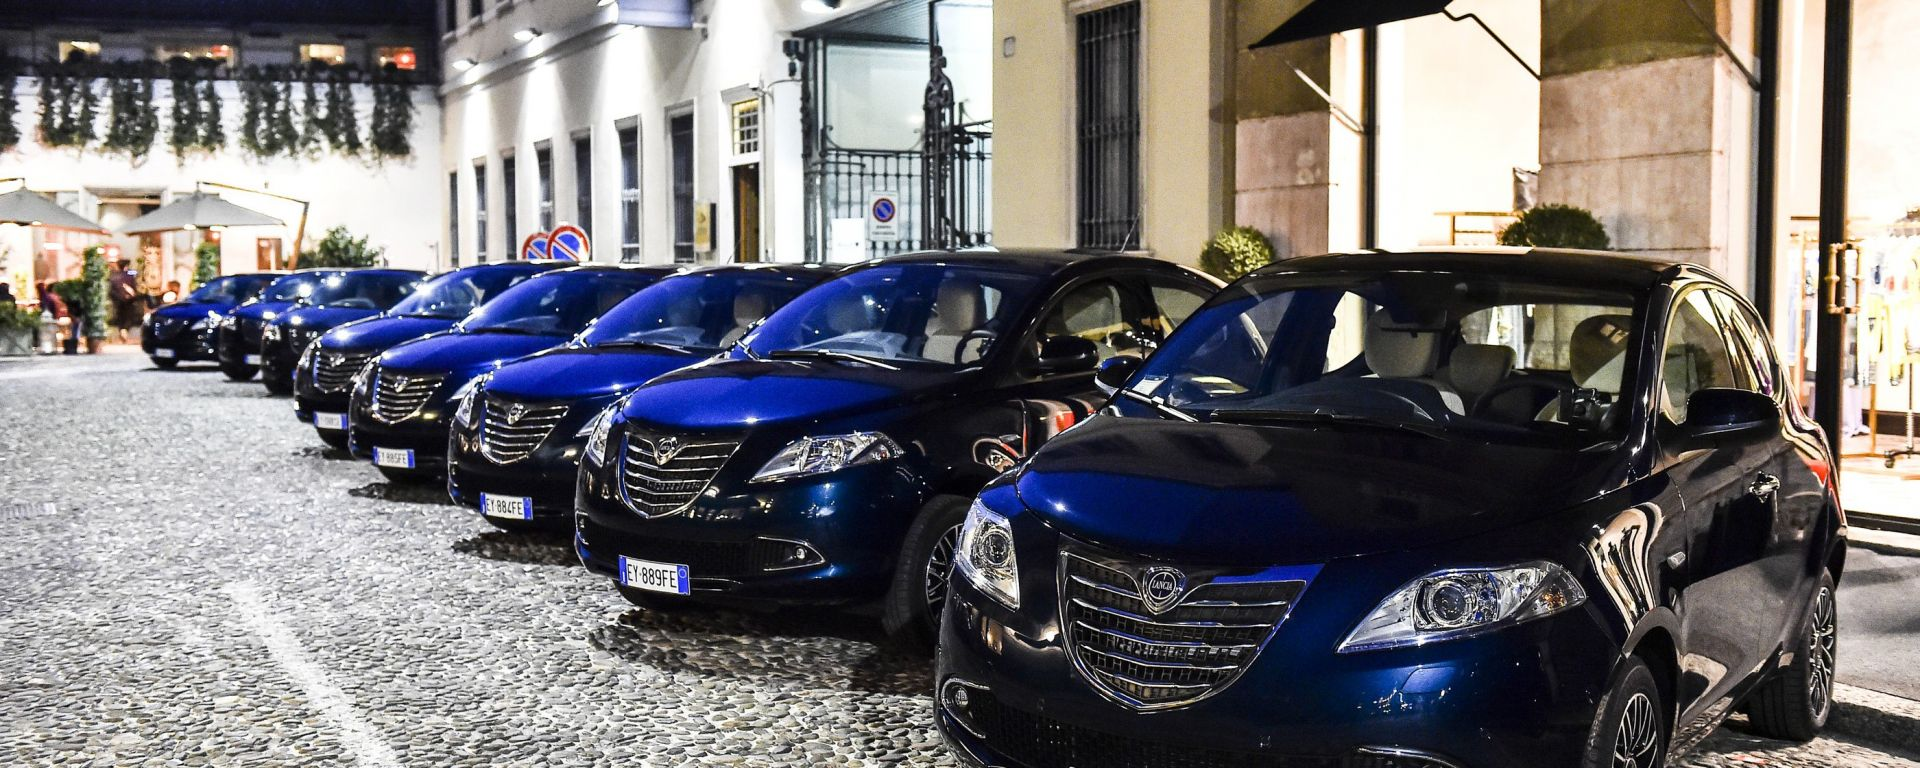 Lancia: Ypsilon 30th Anniversary